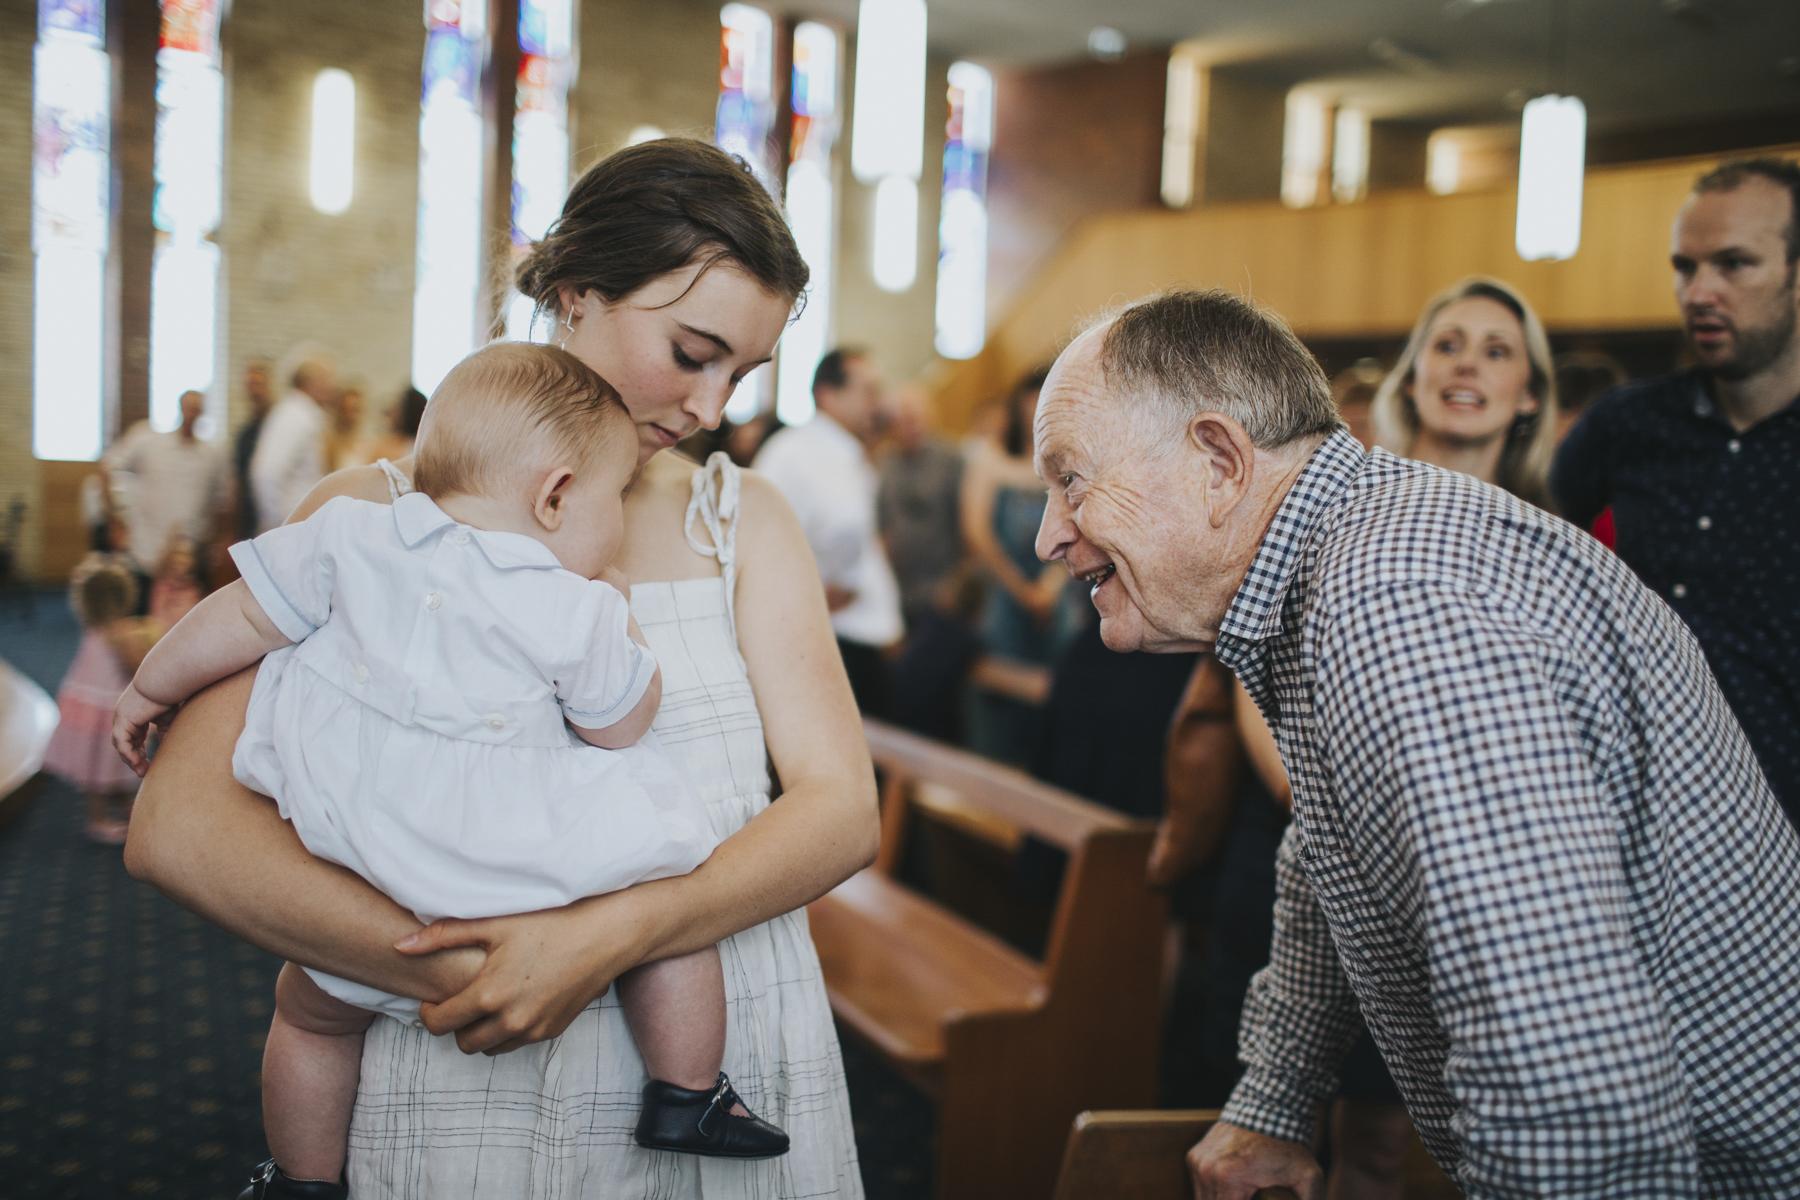 christening_sydney_cronulla_st_aloysius_shire-2067.jpg